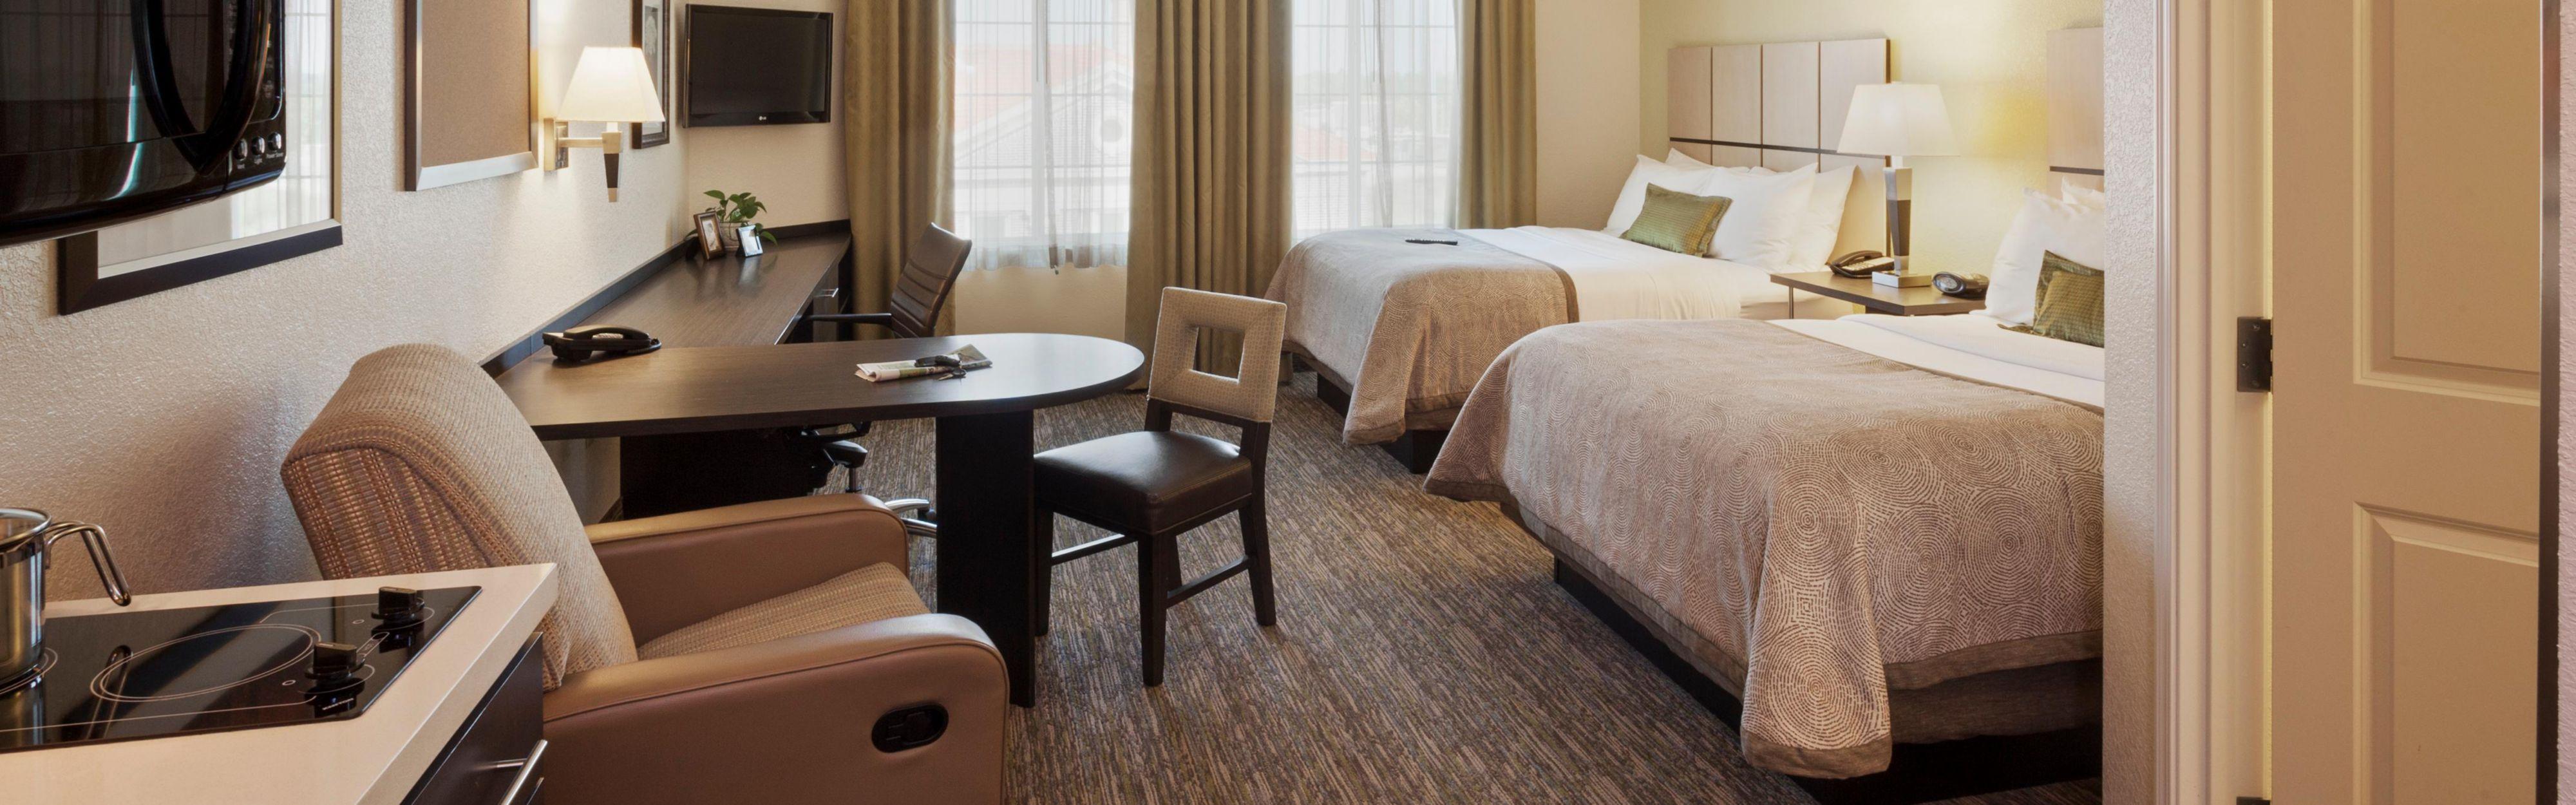 Candlewood Suites Alexandria West image 1